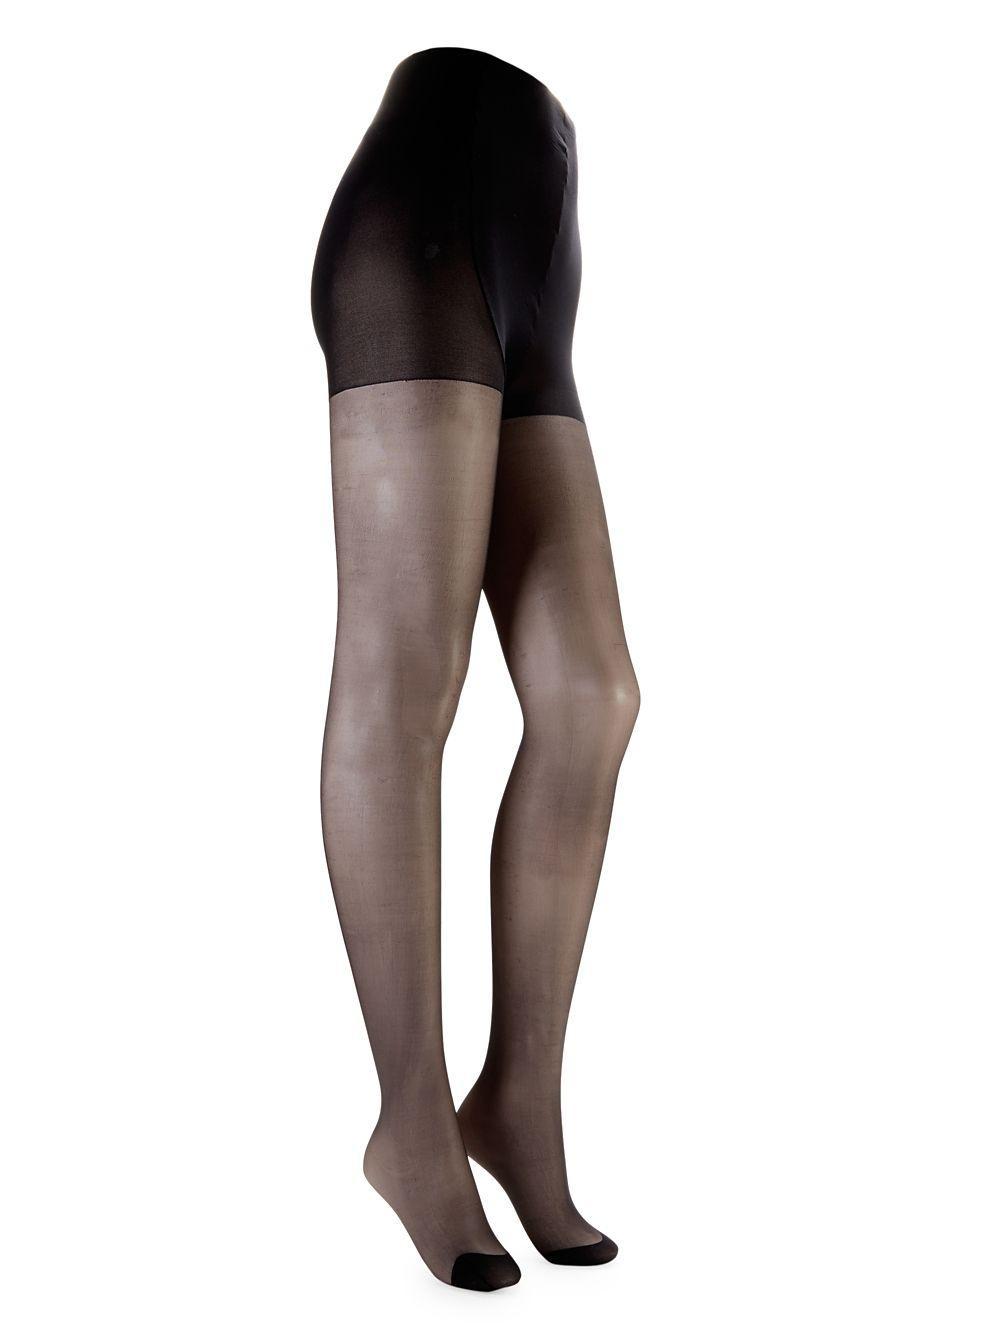 1bb5c4449cb4b Lyst - Pretty Polly Sheer Glossy Tights in Black - Save 5%